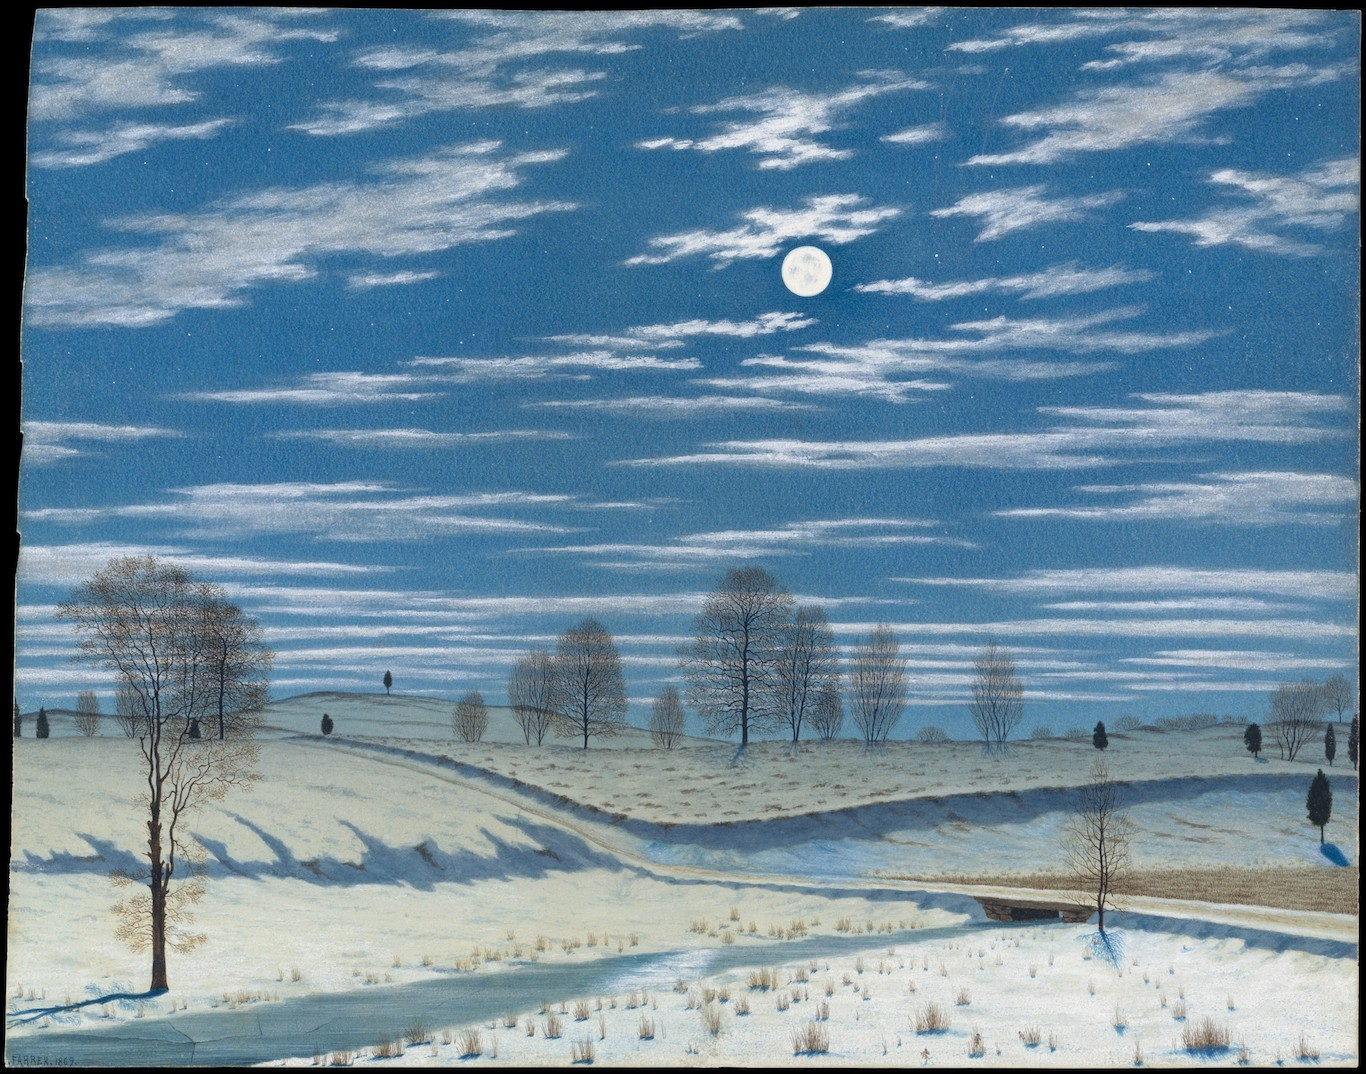 Winter Scene in Moonlight